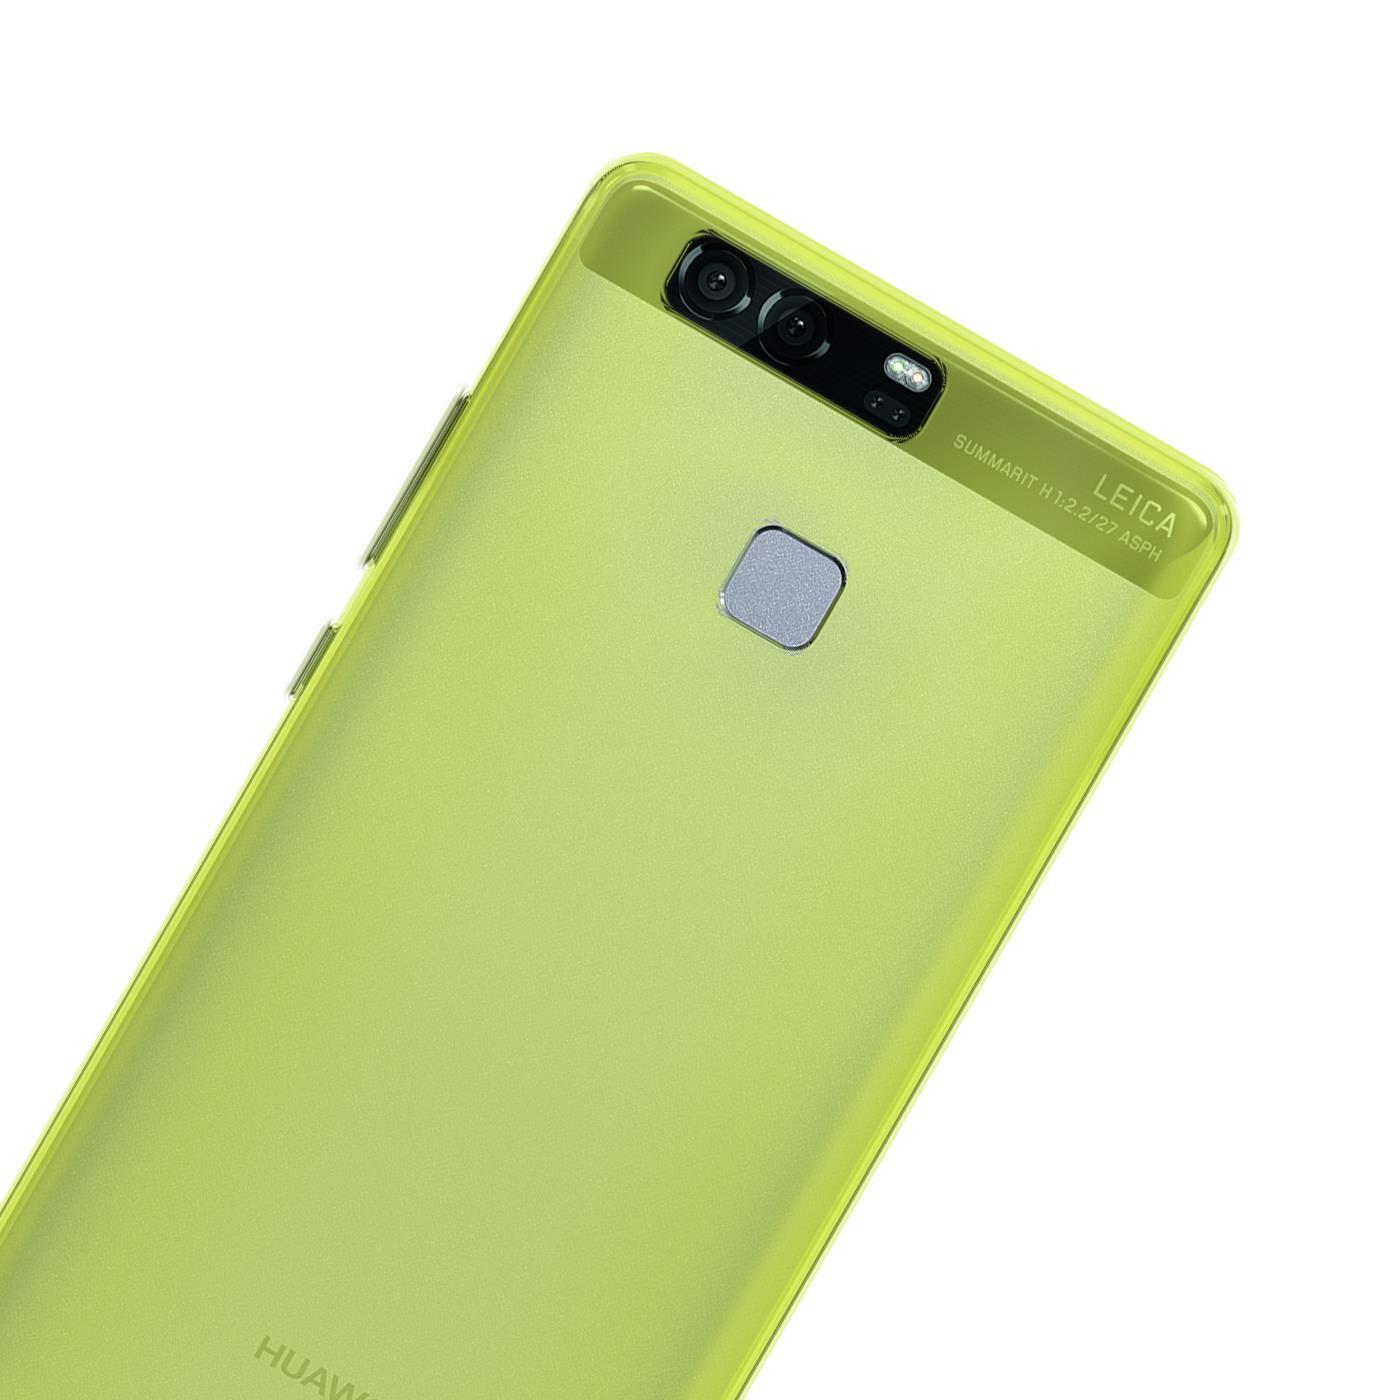 Huawei-p9-Duenn-Silikon-Klar-Case-Cover-Ultra-Slim-Stossfeste-Gel-Rueckseite Indexbild 14